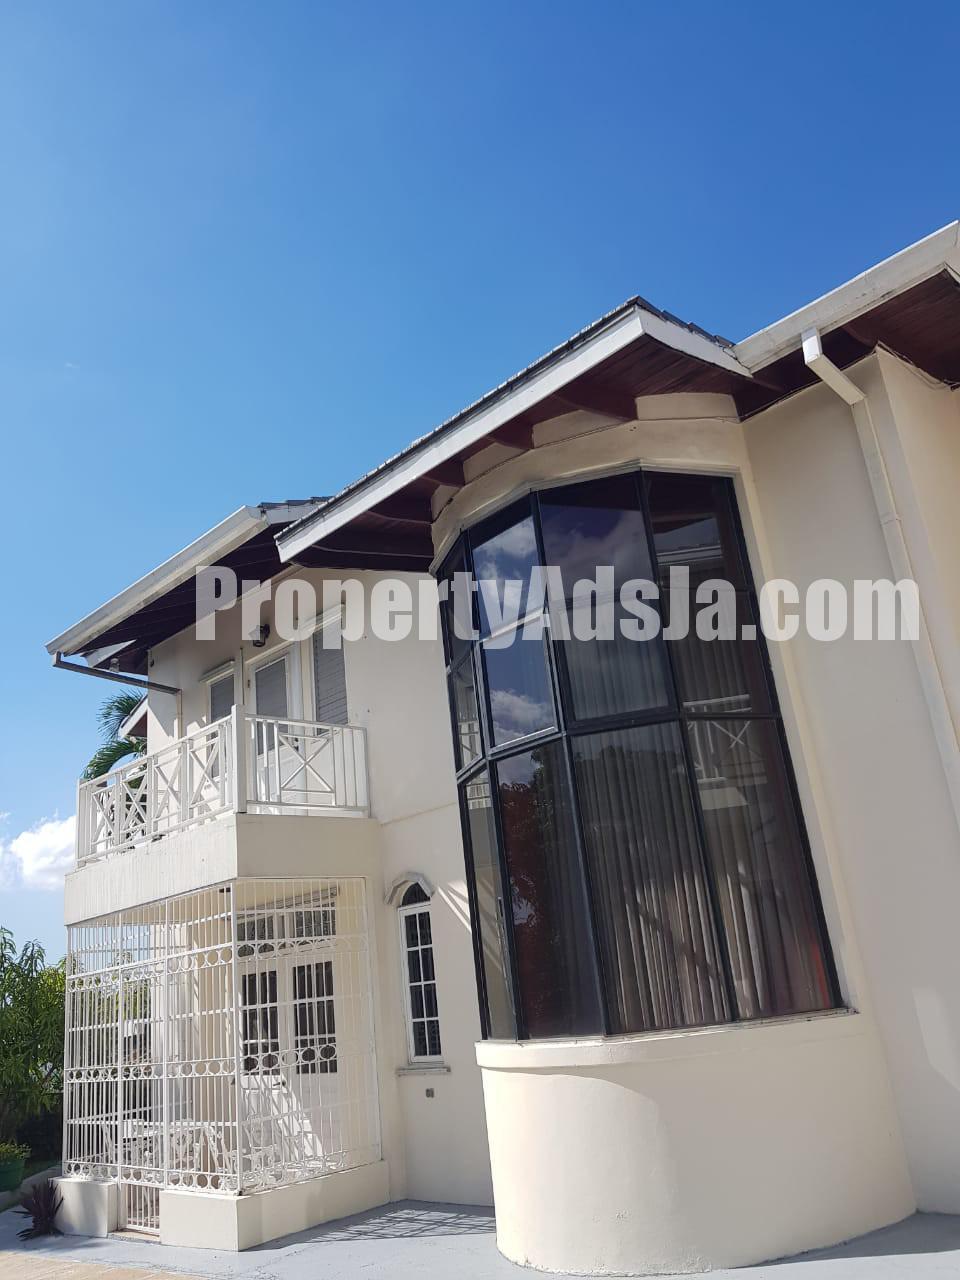 House For Rent in Cherry Gardens, Kingston / St  Andrew Jamaica    PropertyAdsJa com